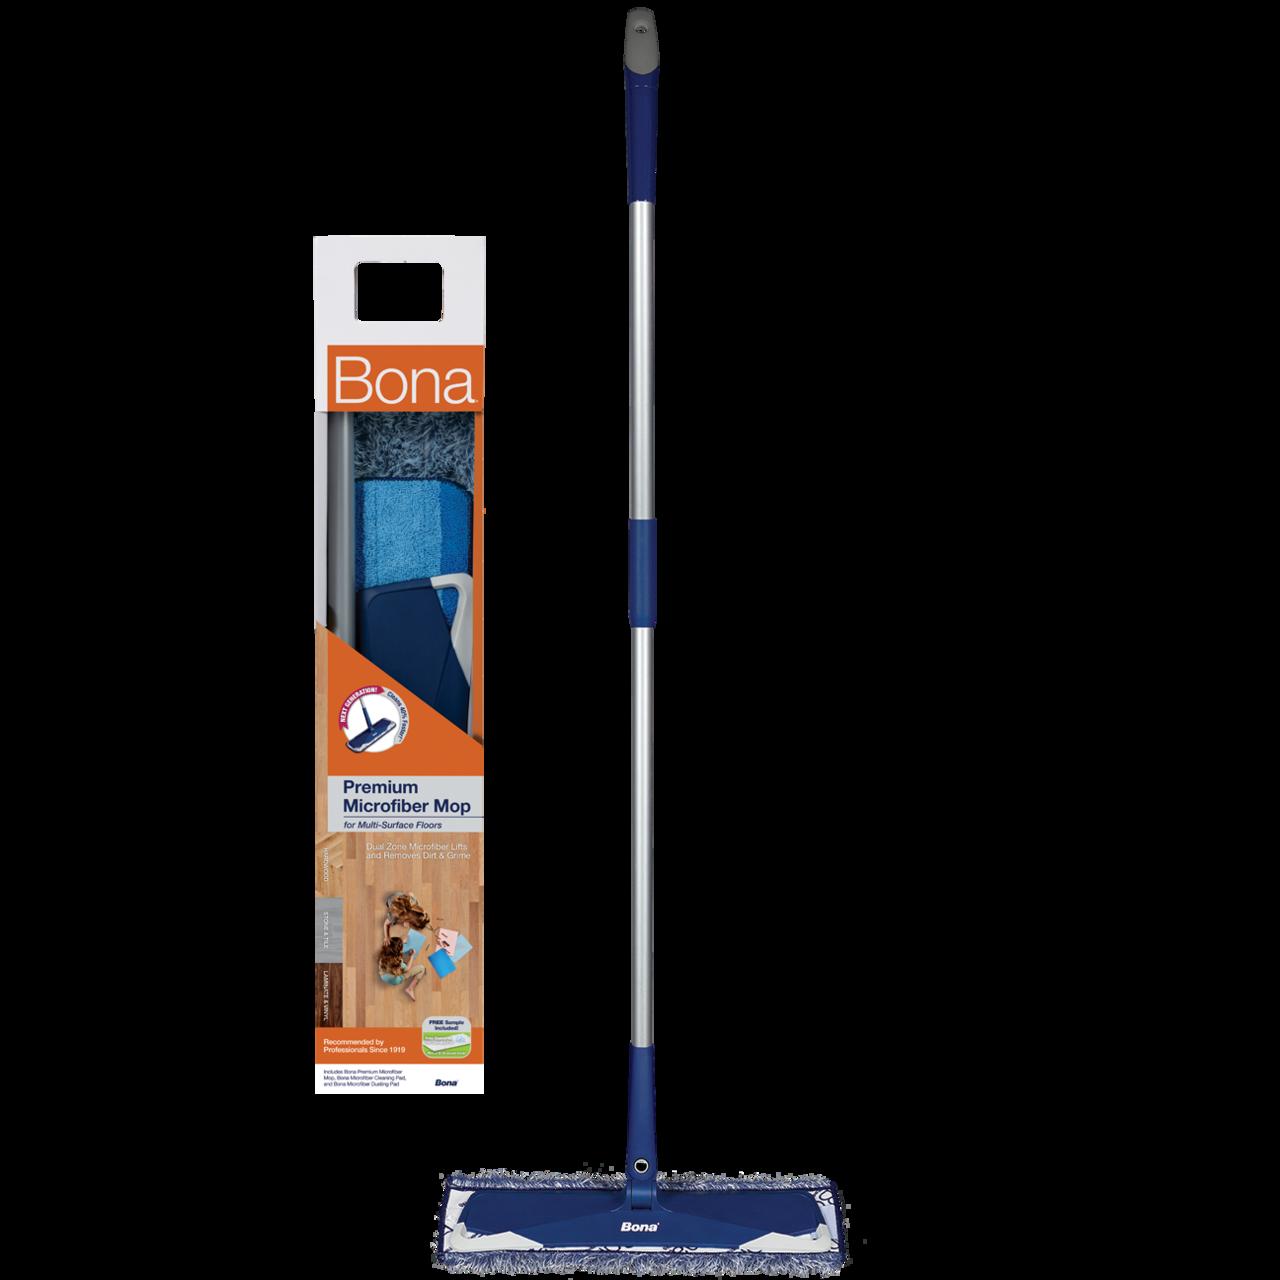 Premium Microfiber Mop For Hard Surface Floors Microfiber Mops Hardwood Floors Microfiber